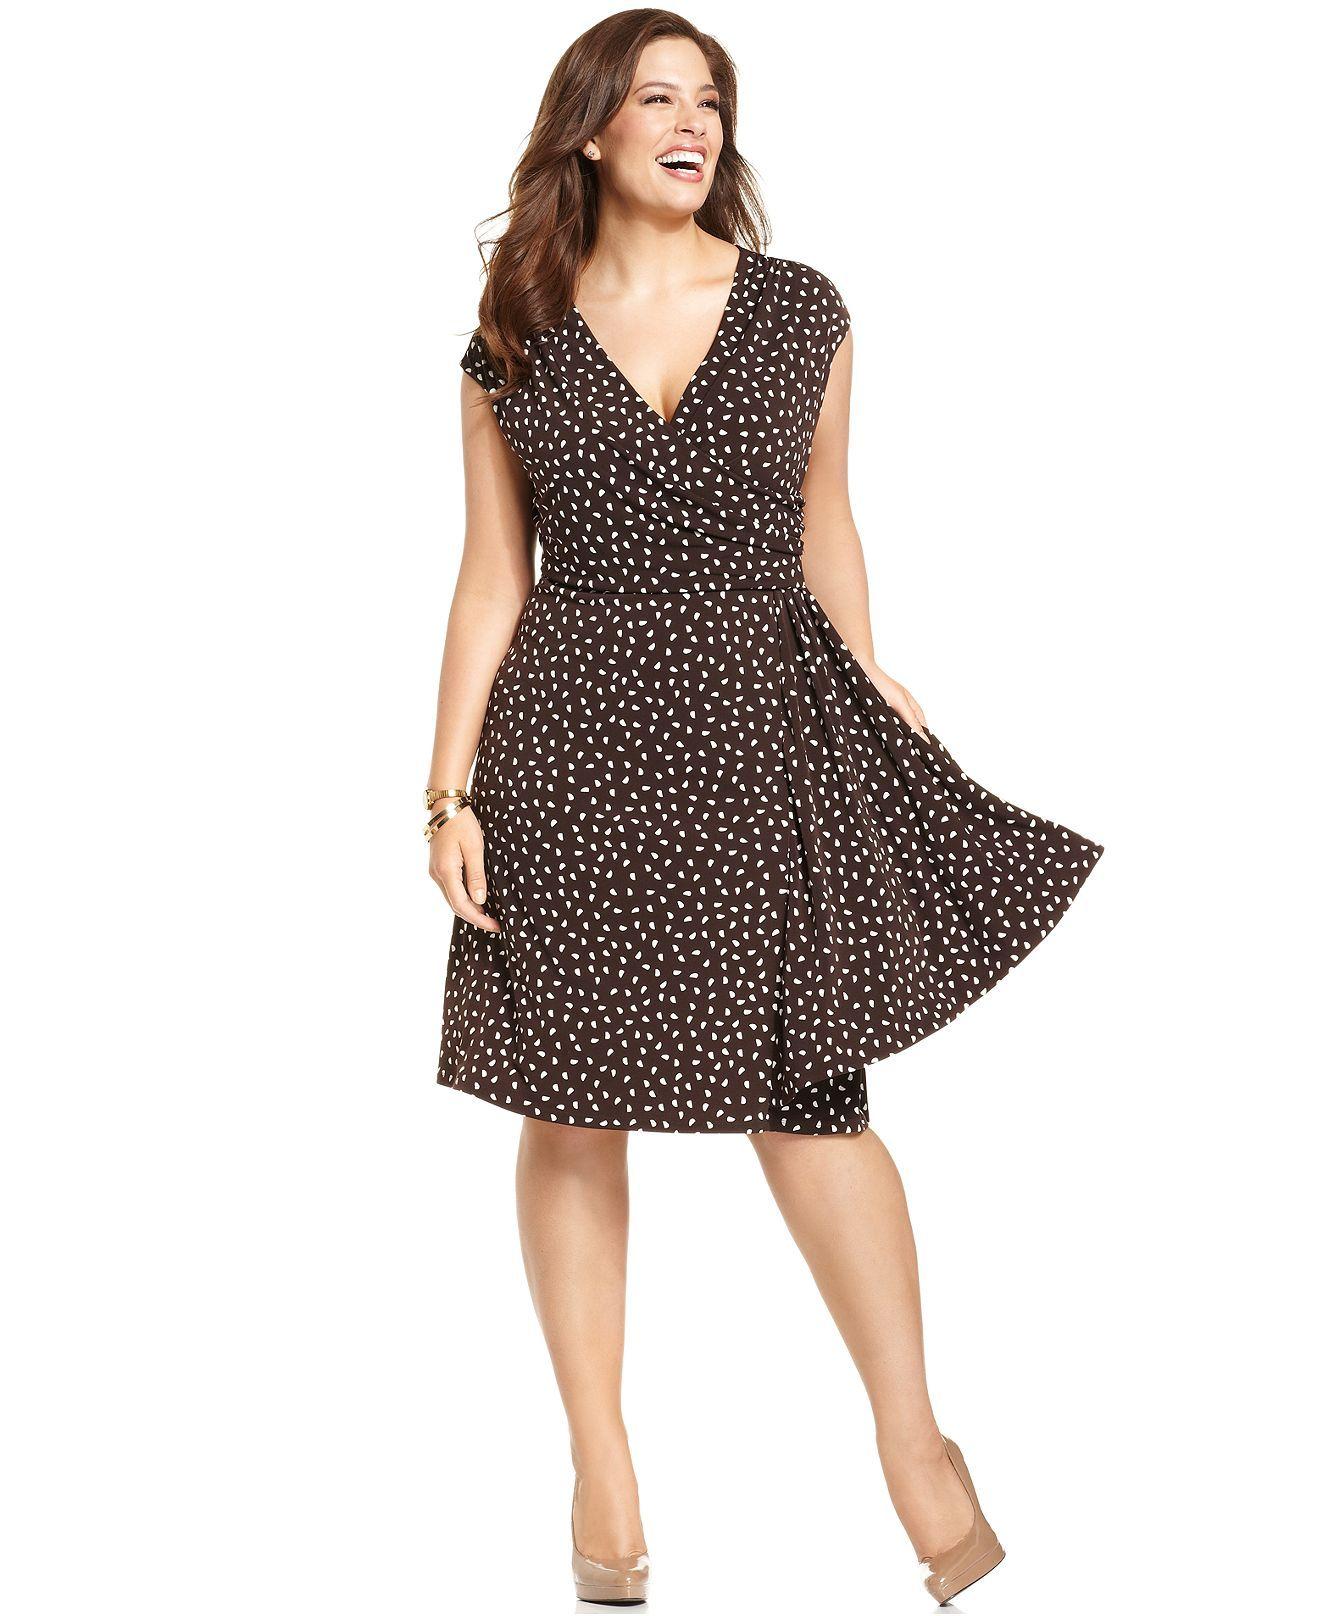 572bafe6ad0 Charter Club Plus Size Dress